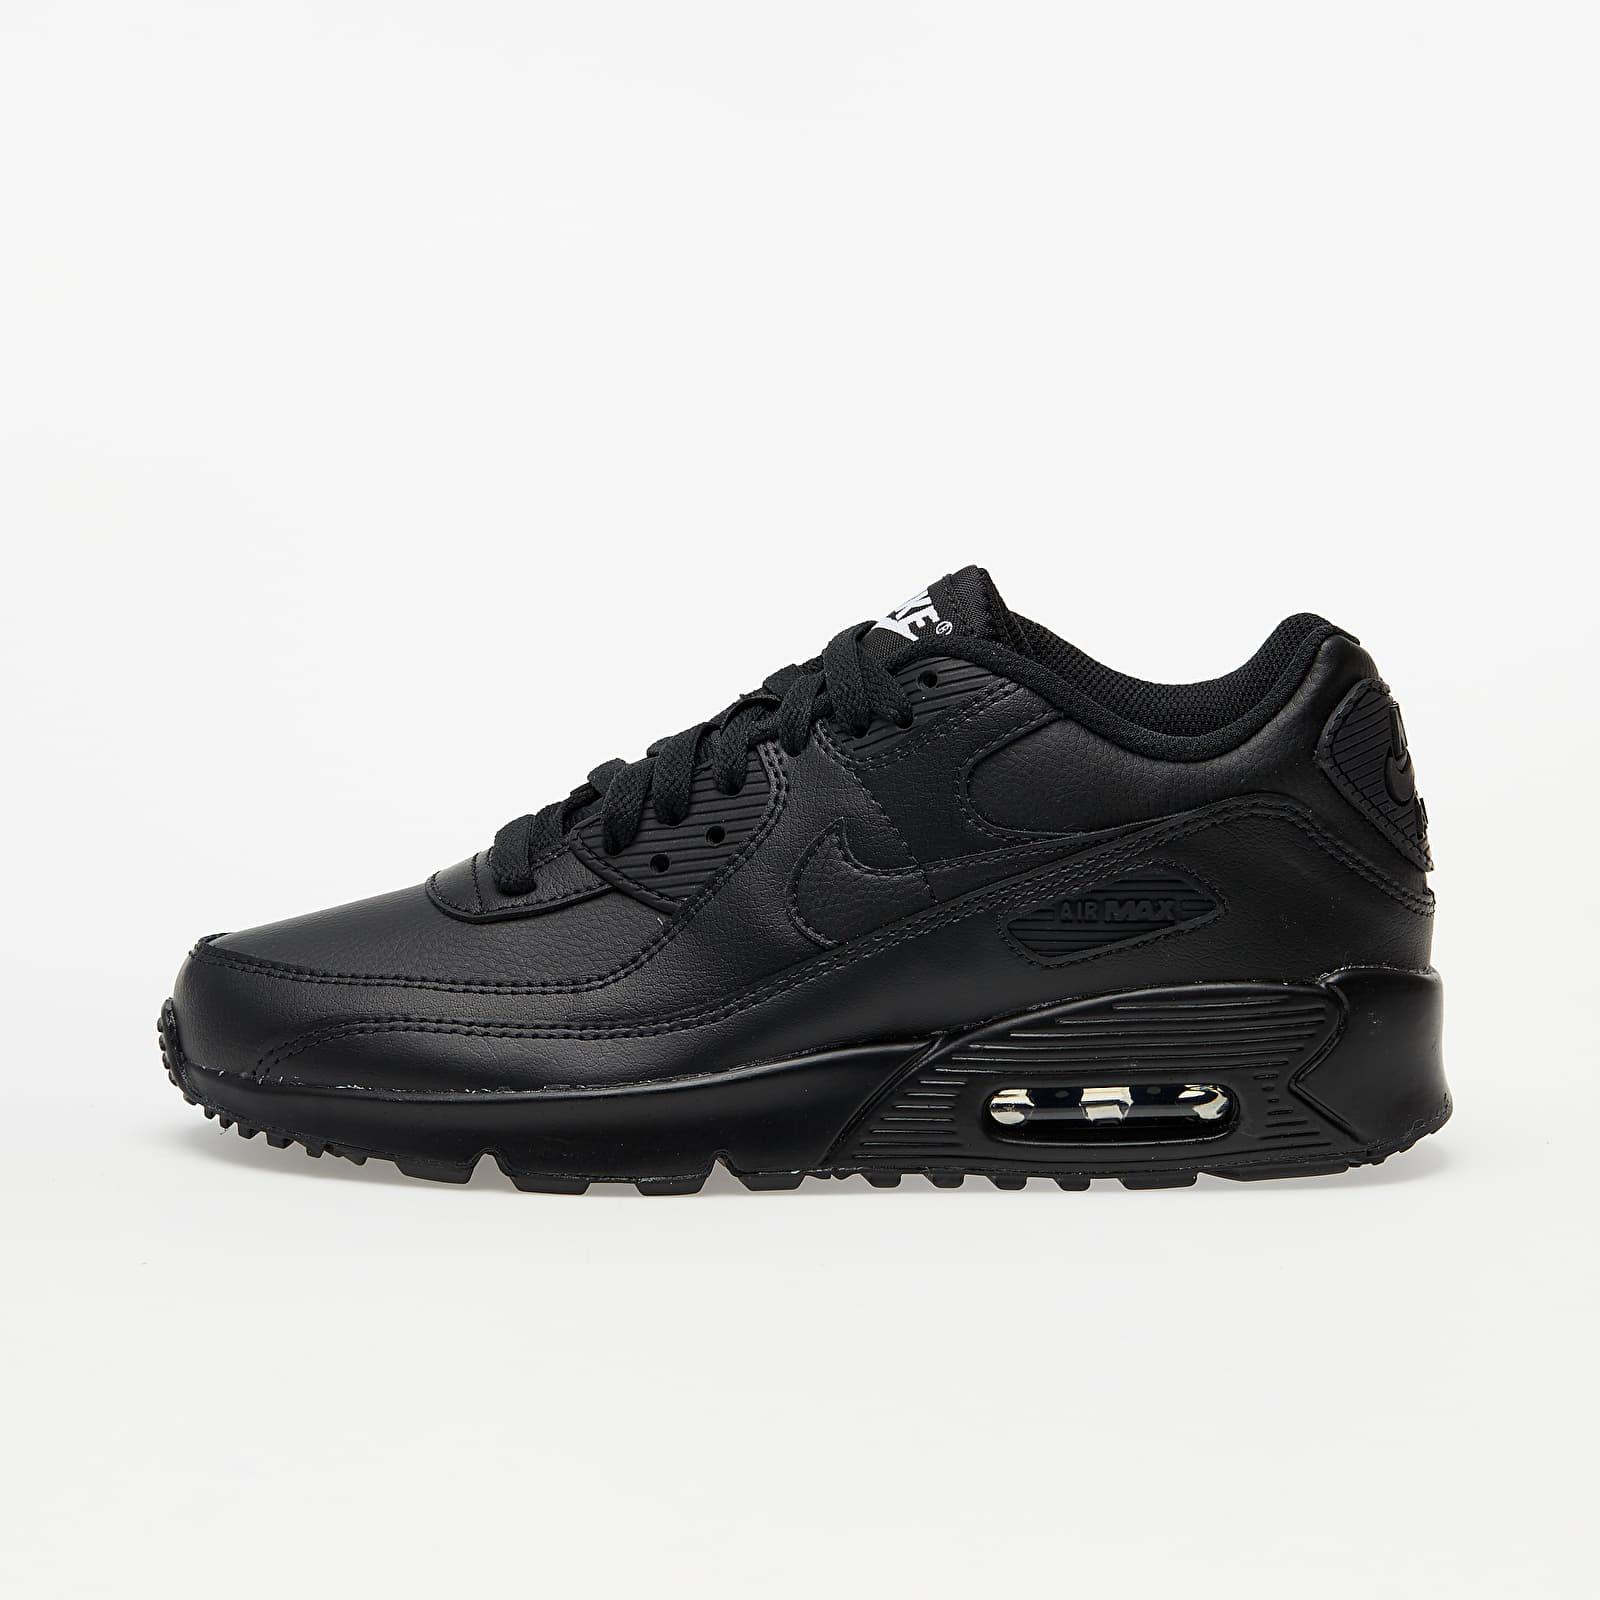 Nike Air Max 90 Leather (GS) Black/ Black-Black-White EUR 40